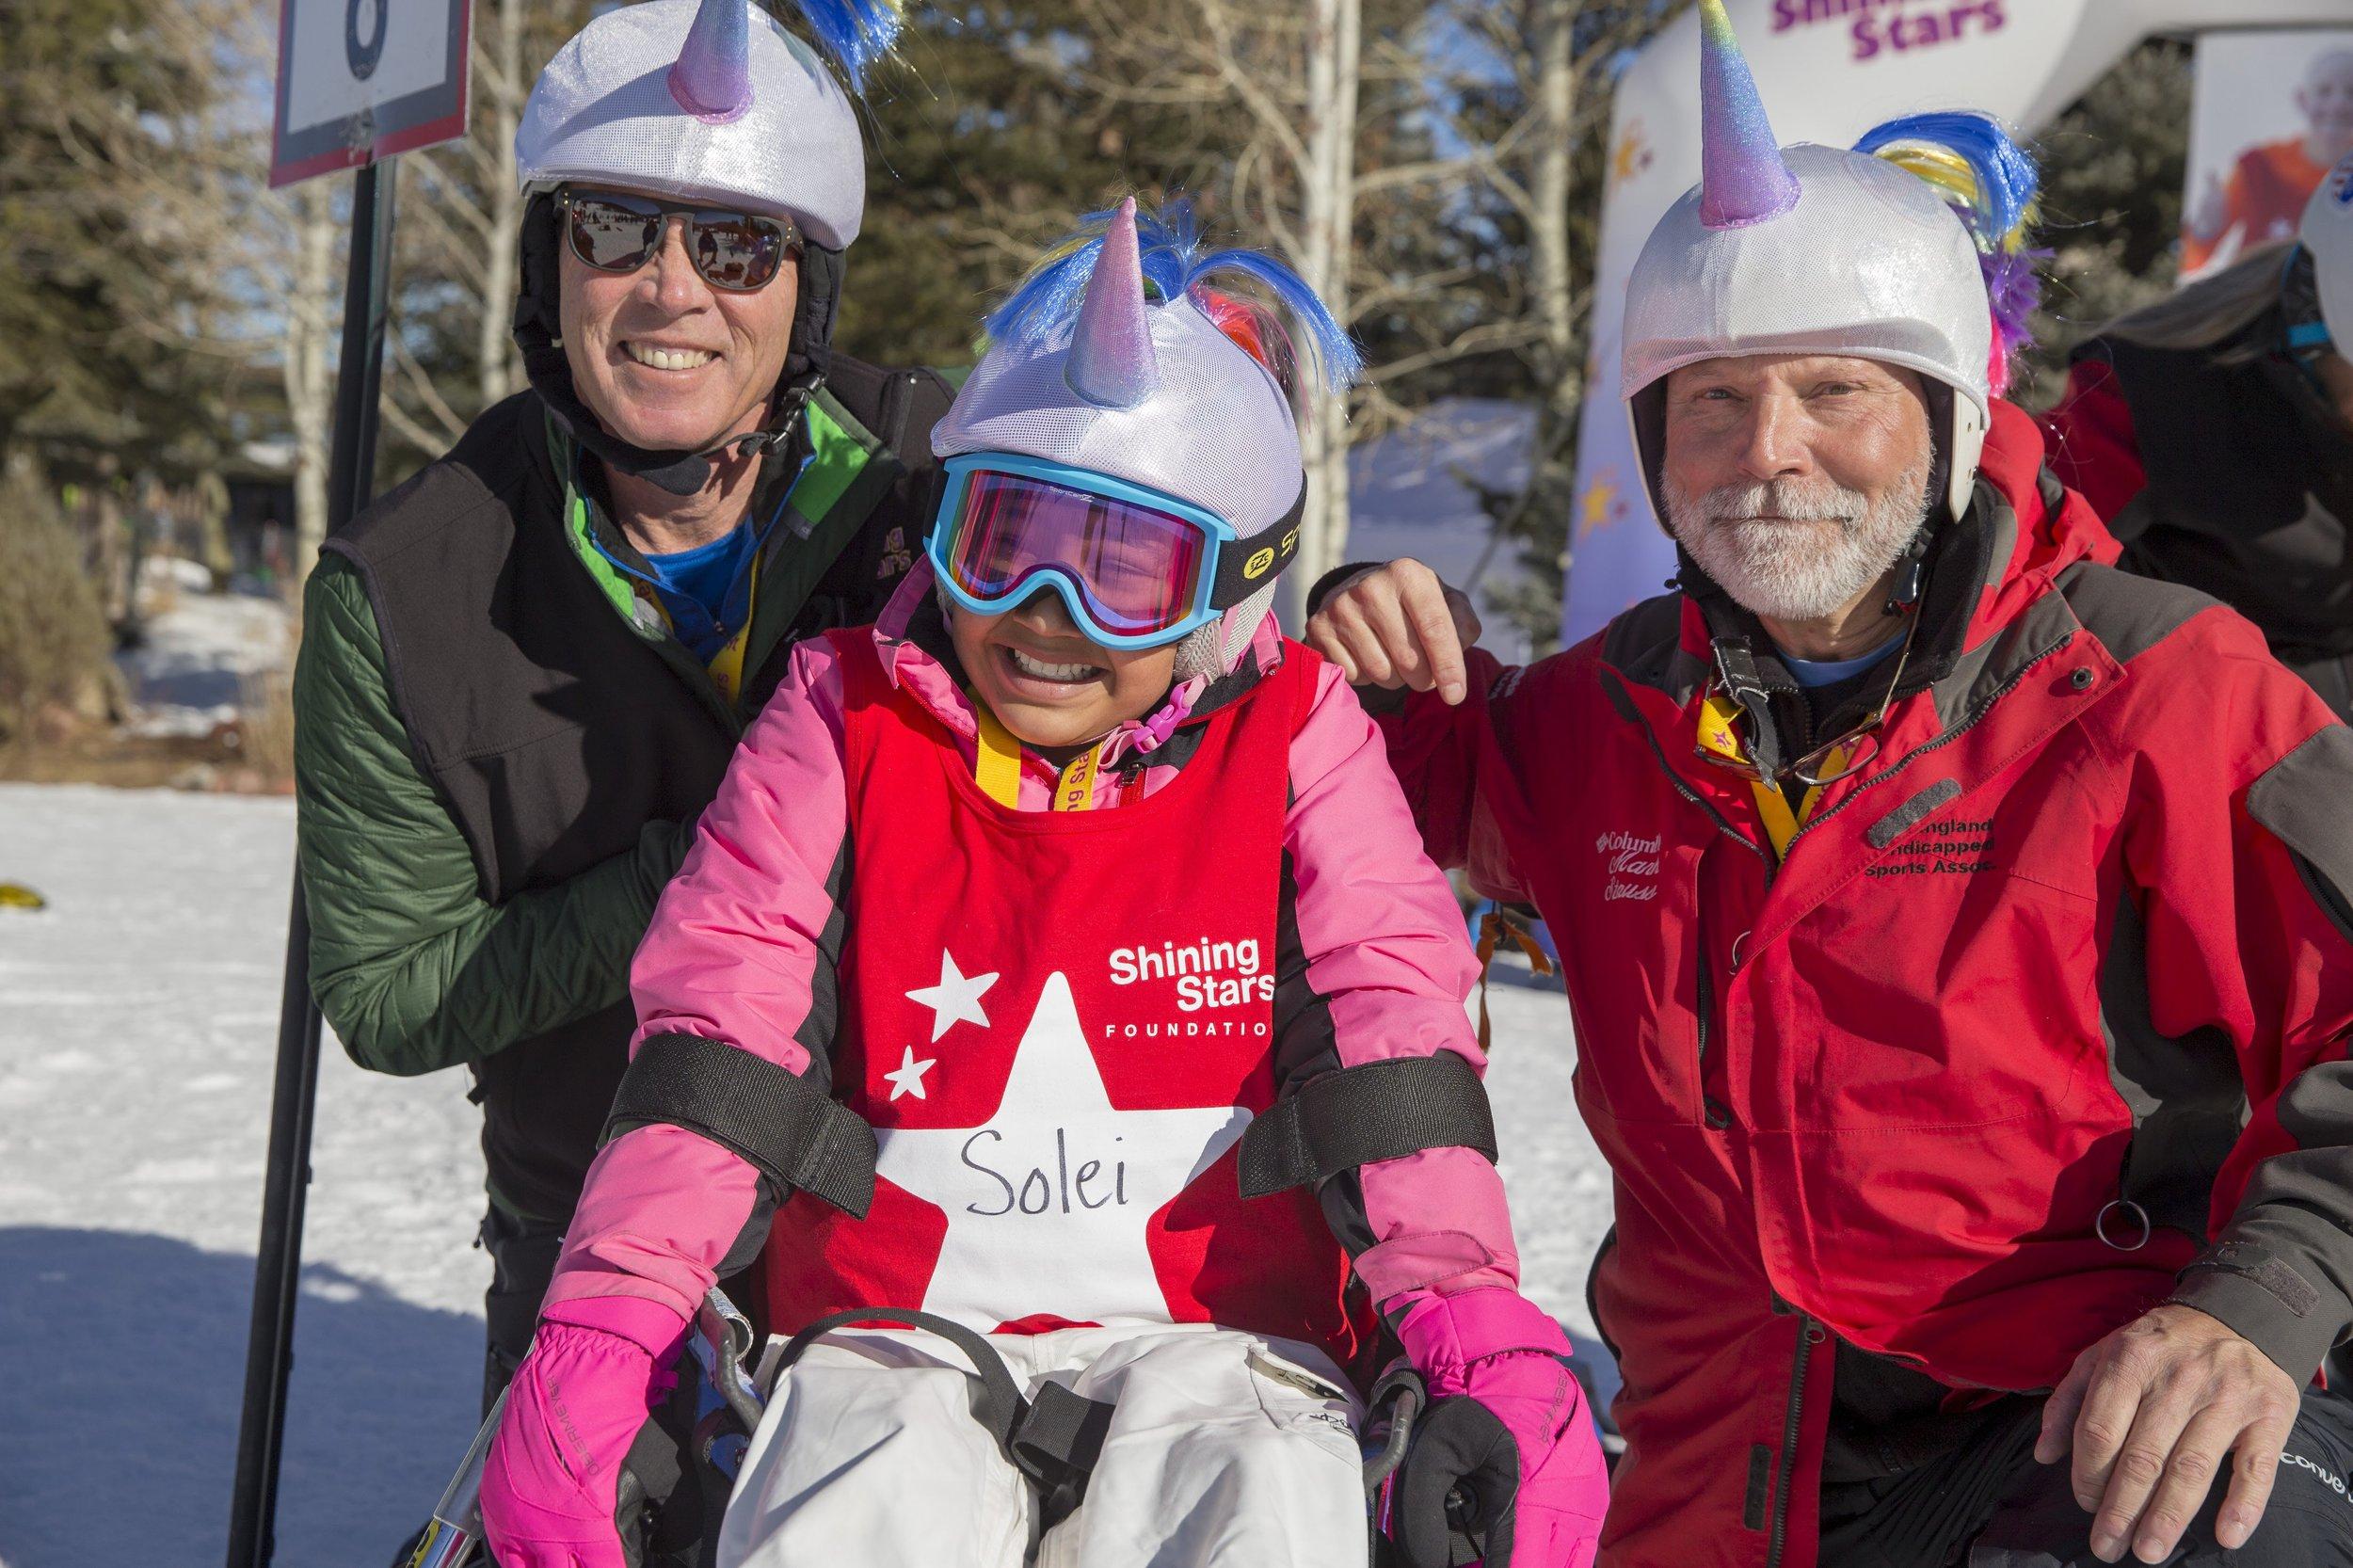 2018 Aspen Winter Games